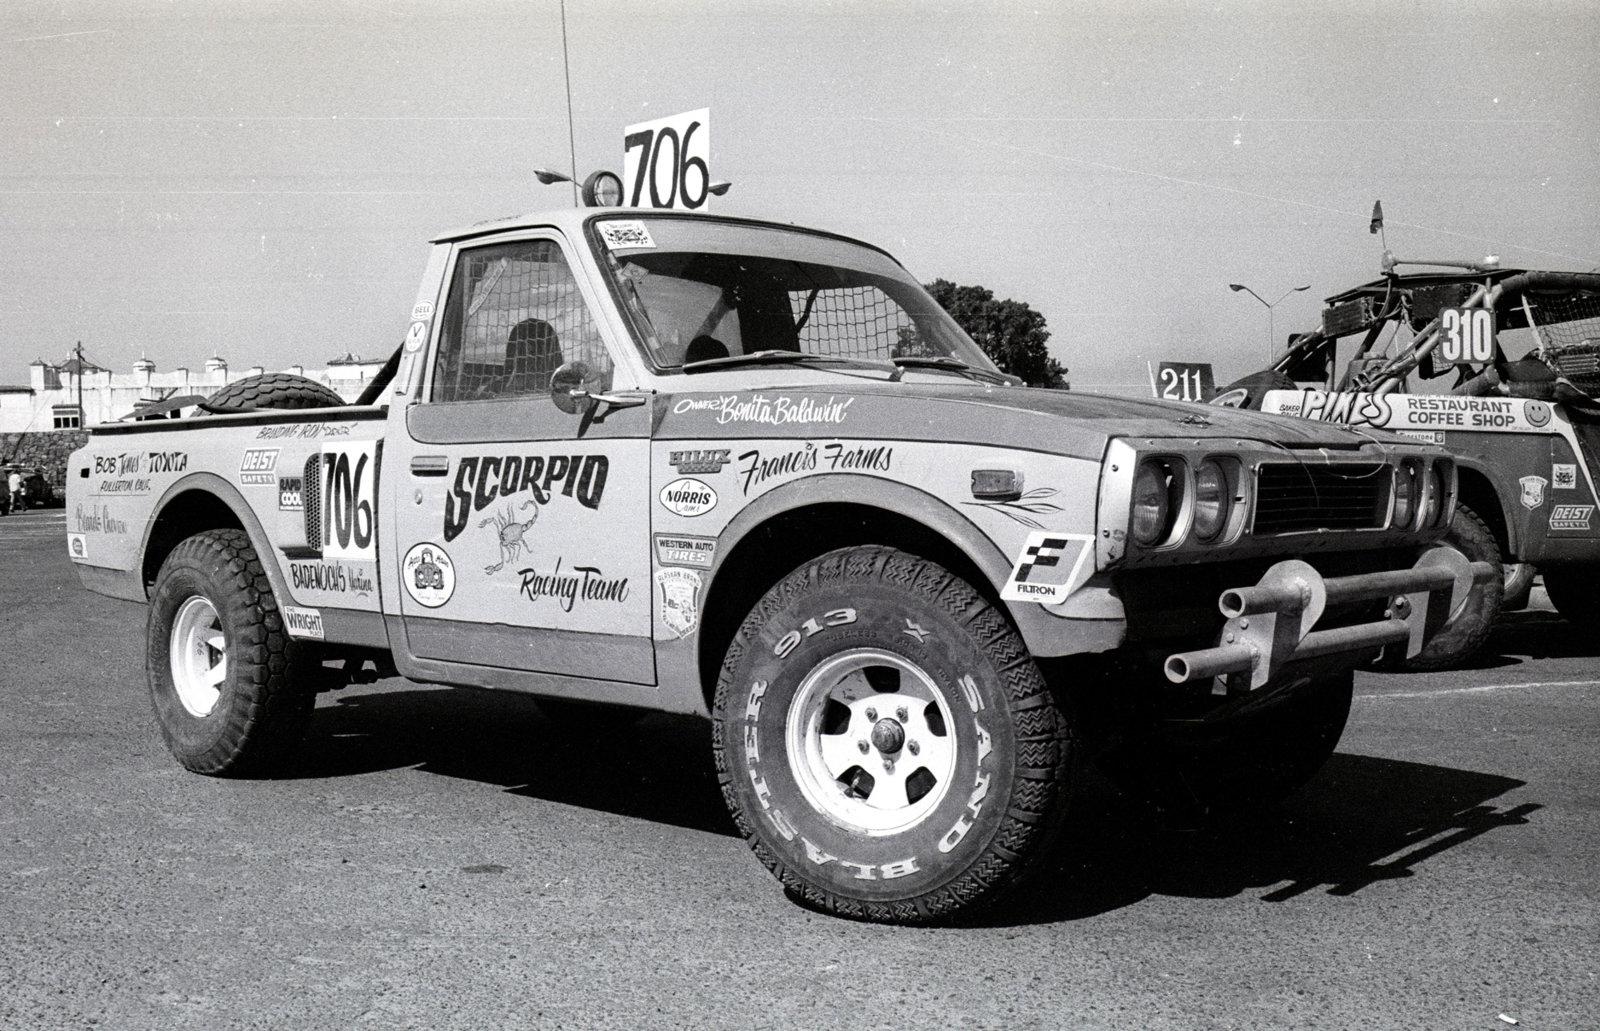 CenterlineImages.1976.Baja 500.Baldwin.toyota.21x.jpg